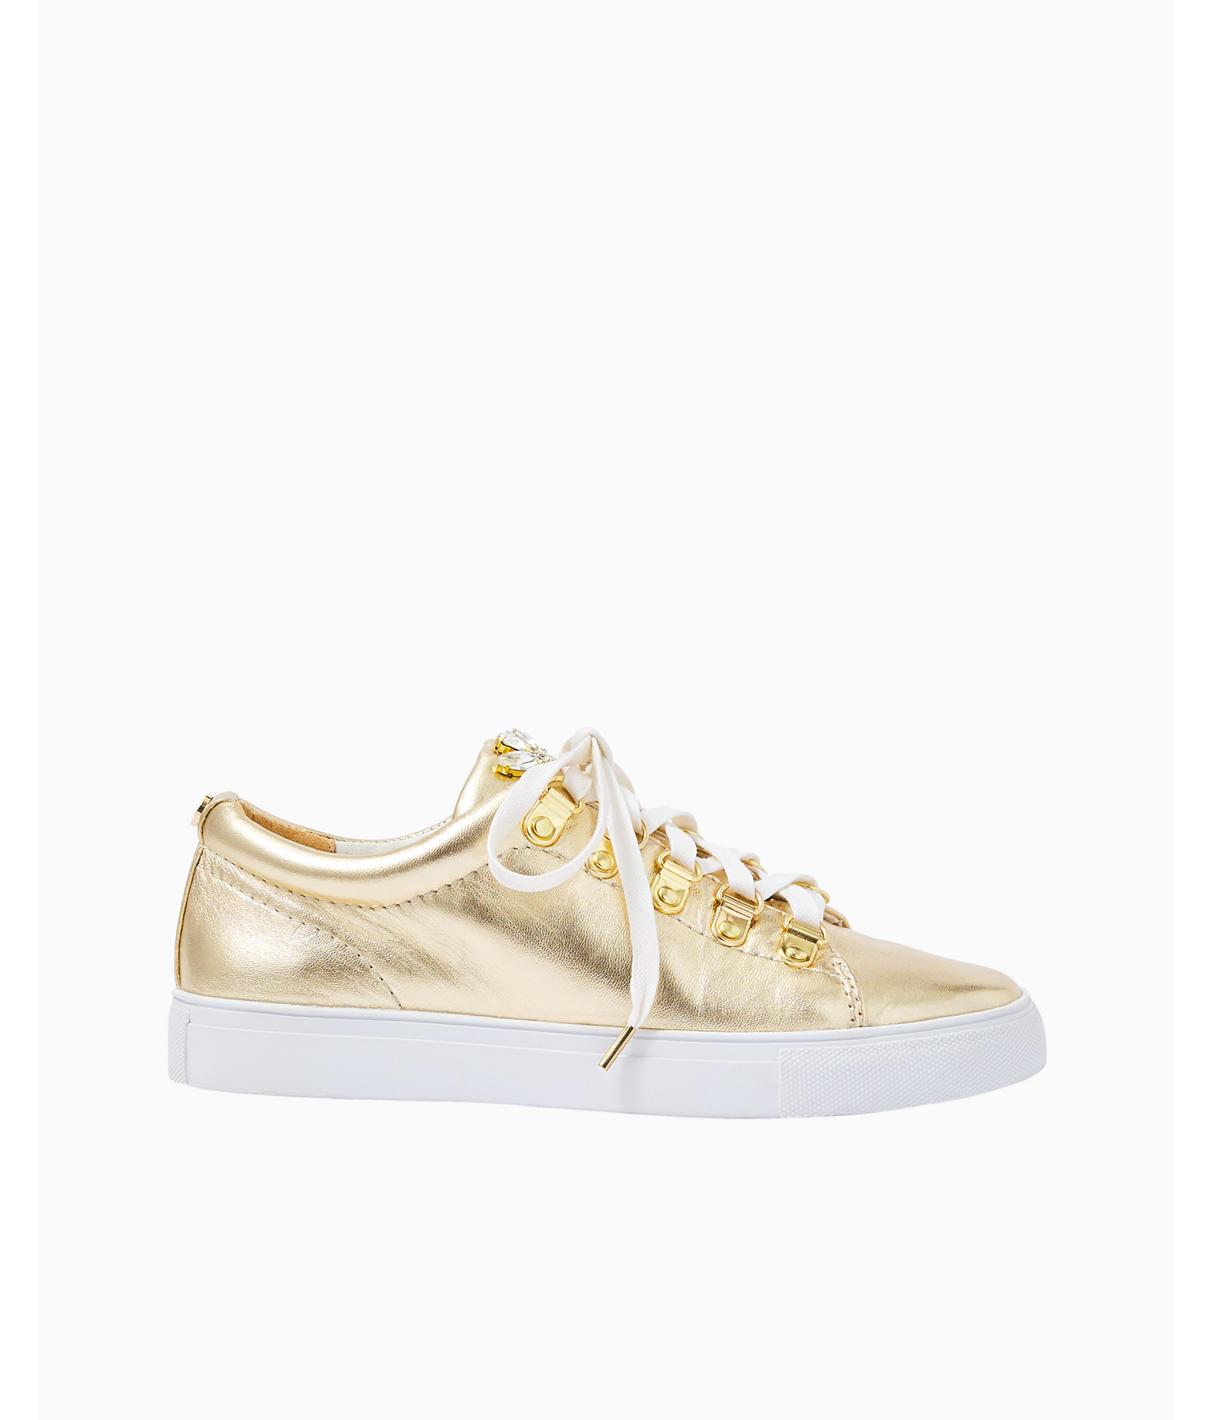 Lilly Pulitzer Hallie Sneaker In Gold Metallic